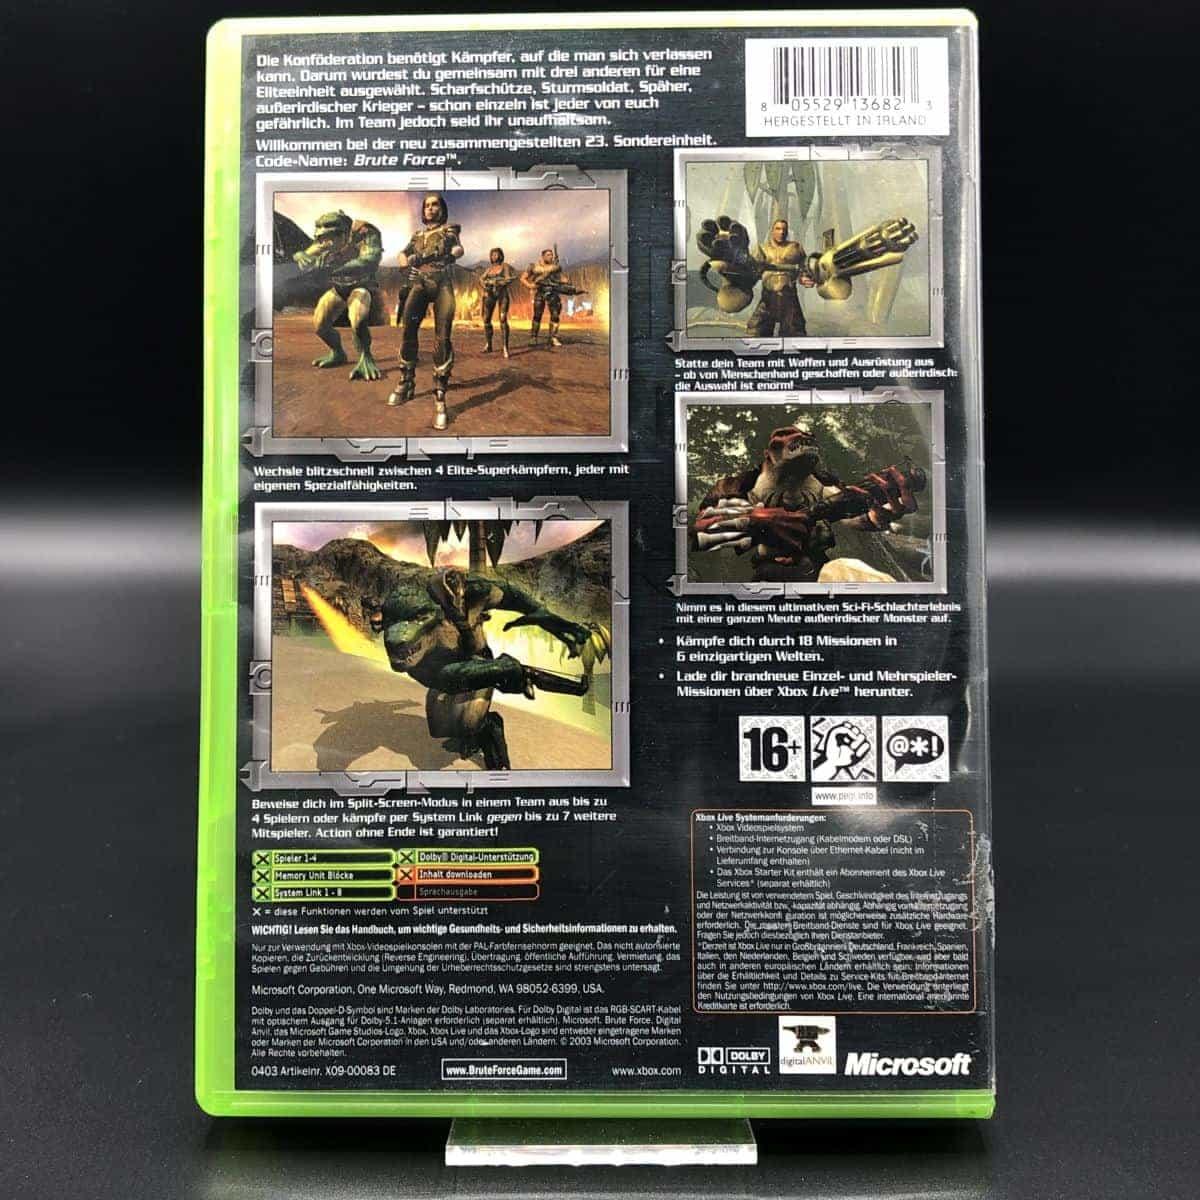 XBC Brute Force (Komplett) (Sehr gut) Microsoft Xbox Classic